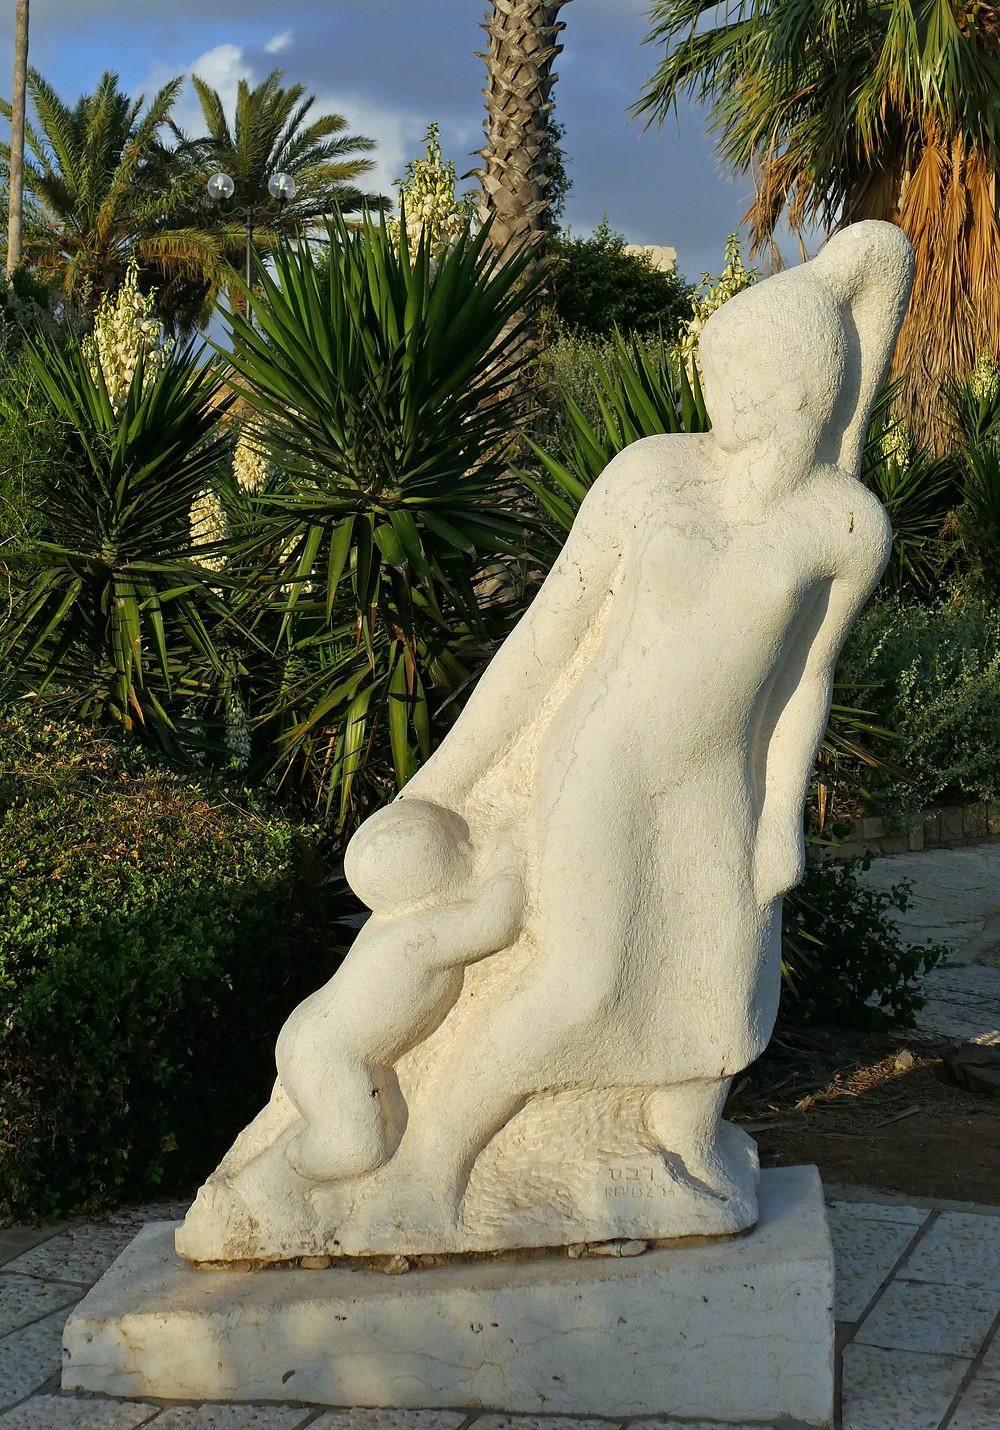 Skulptur Meeresbrise von Andre Revesz in Jaffa